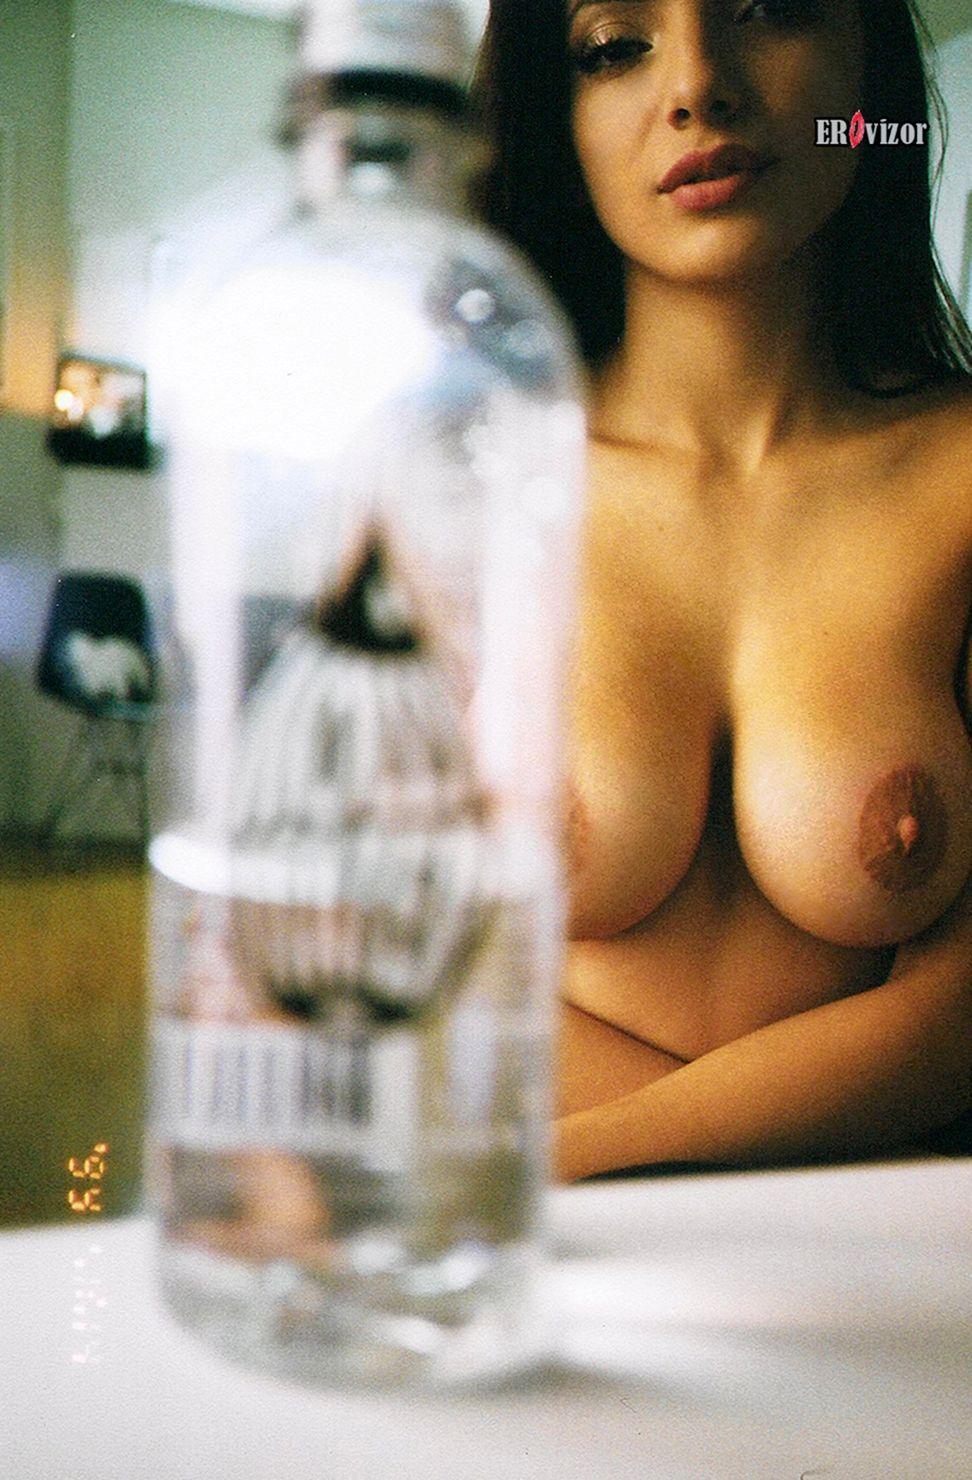 legkaya_erotica-erovizor (15)